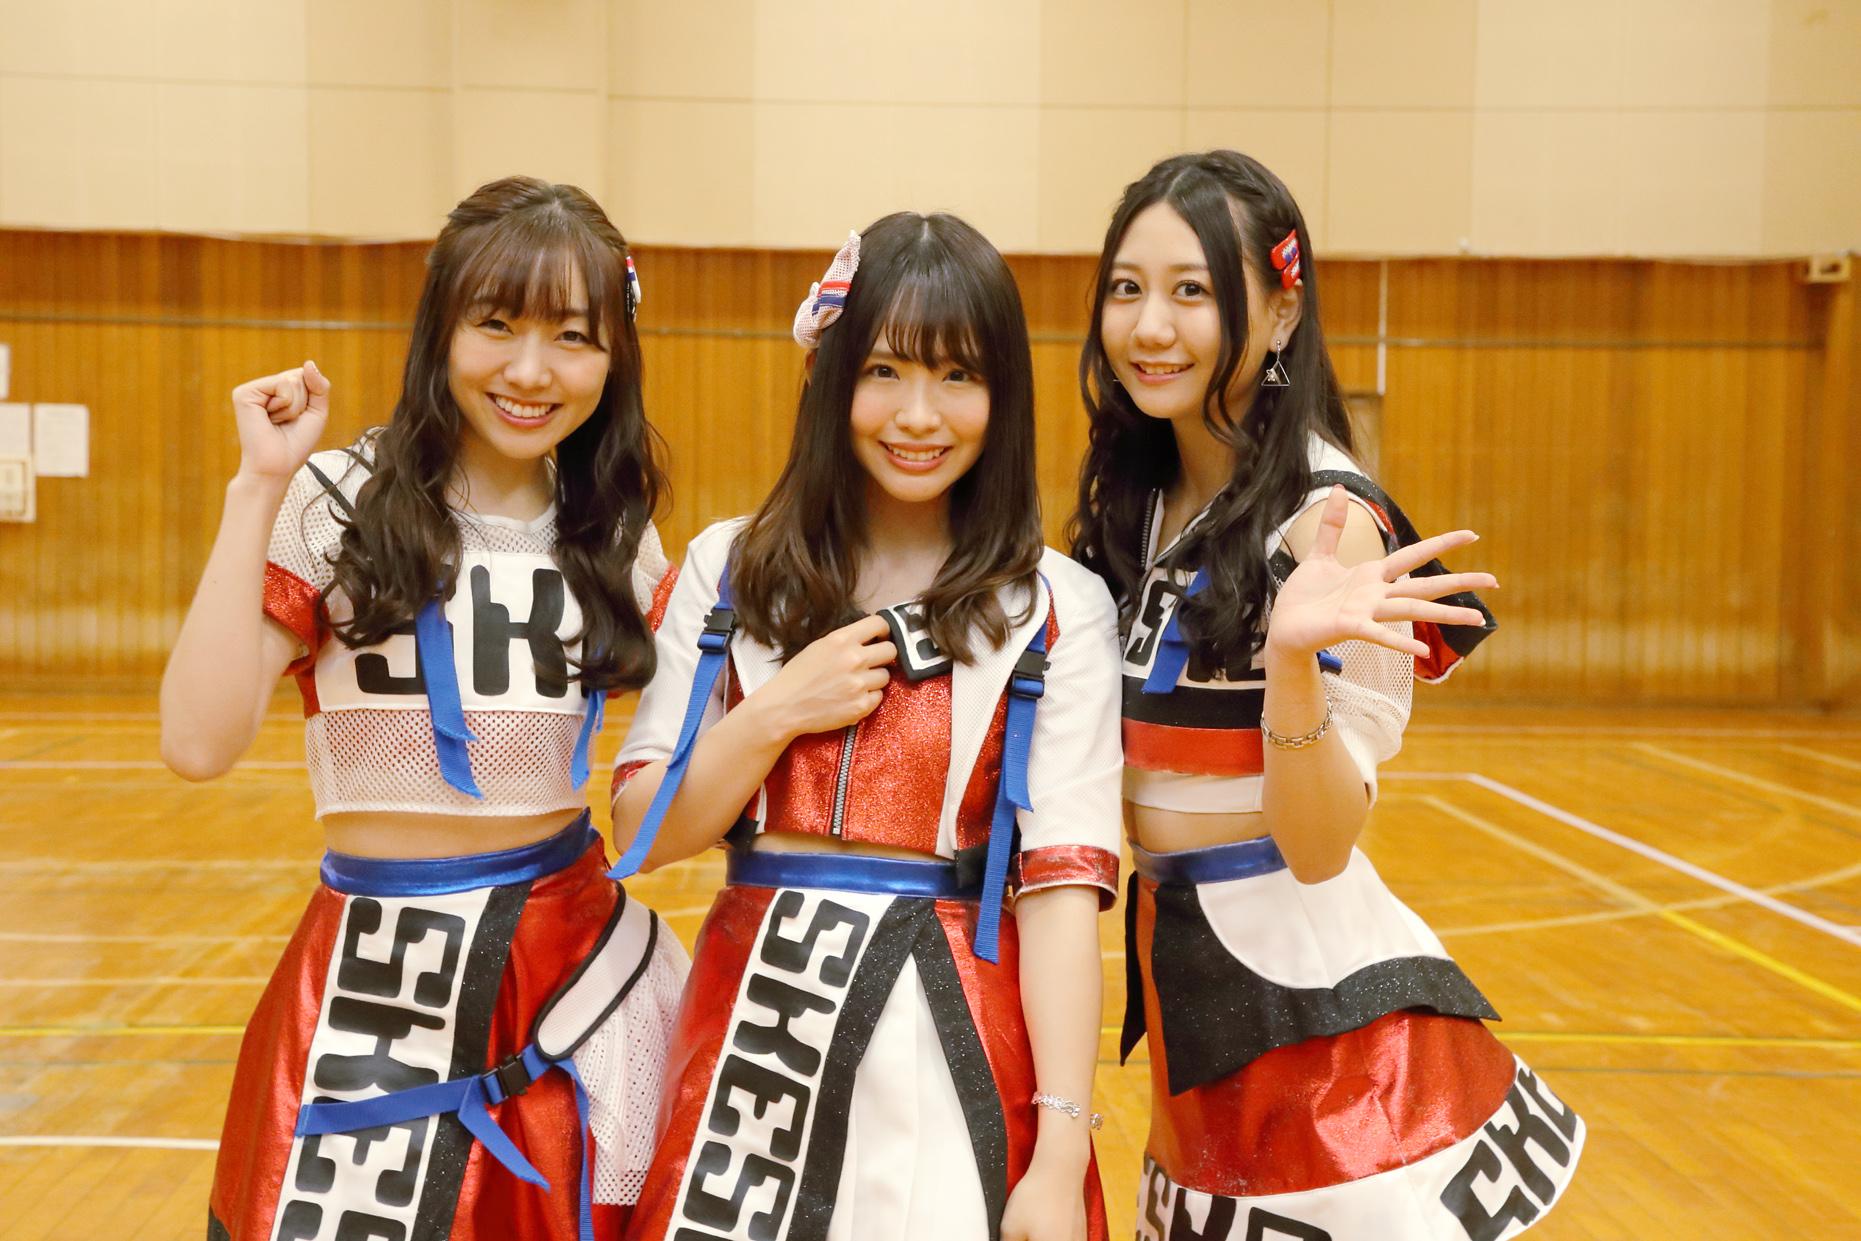 左から須田亜香里、松村香織、古畑奈和